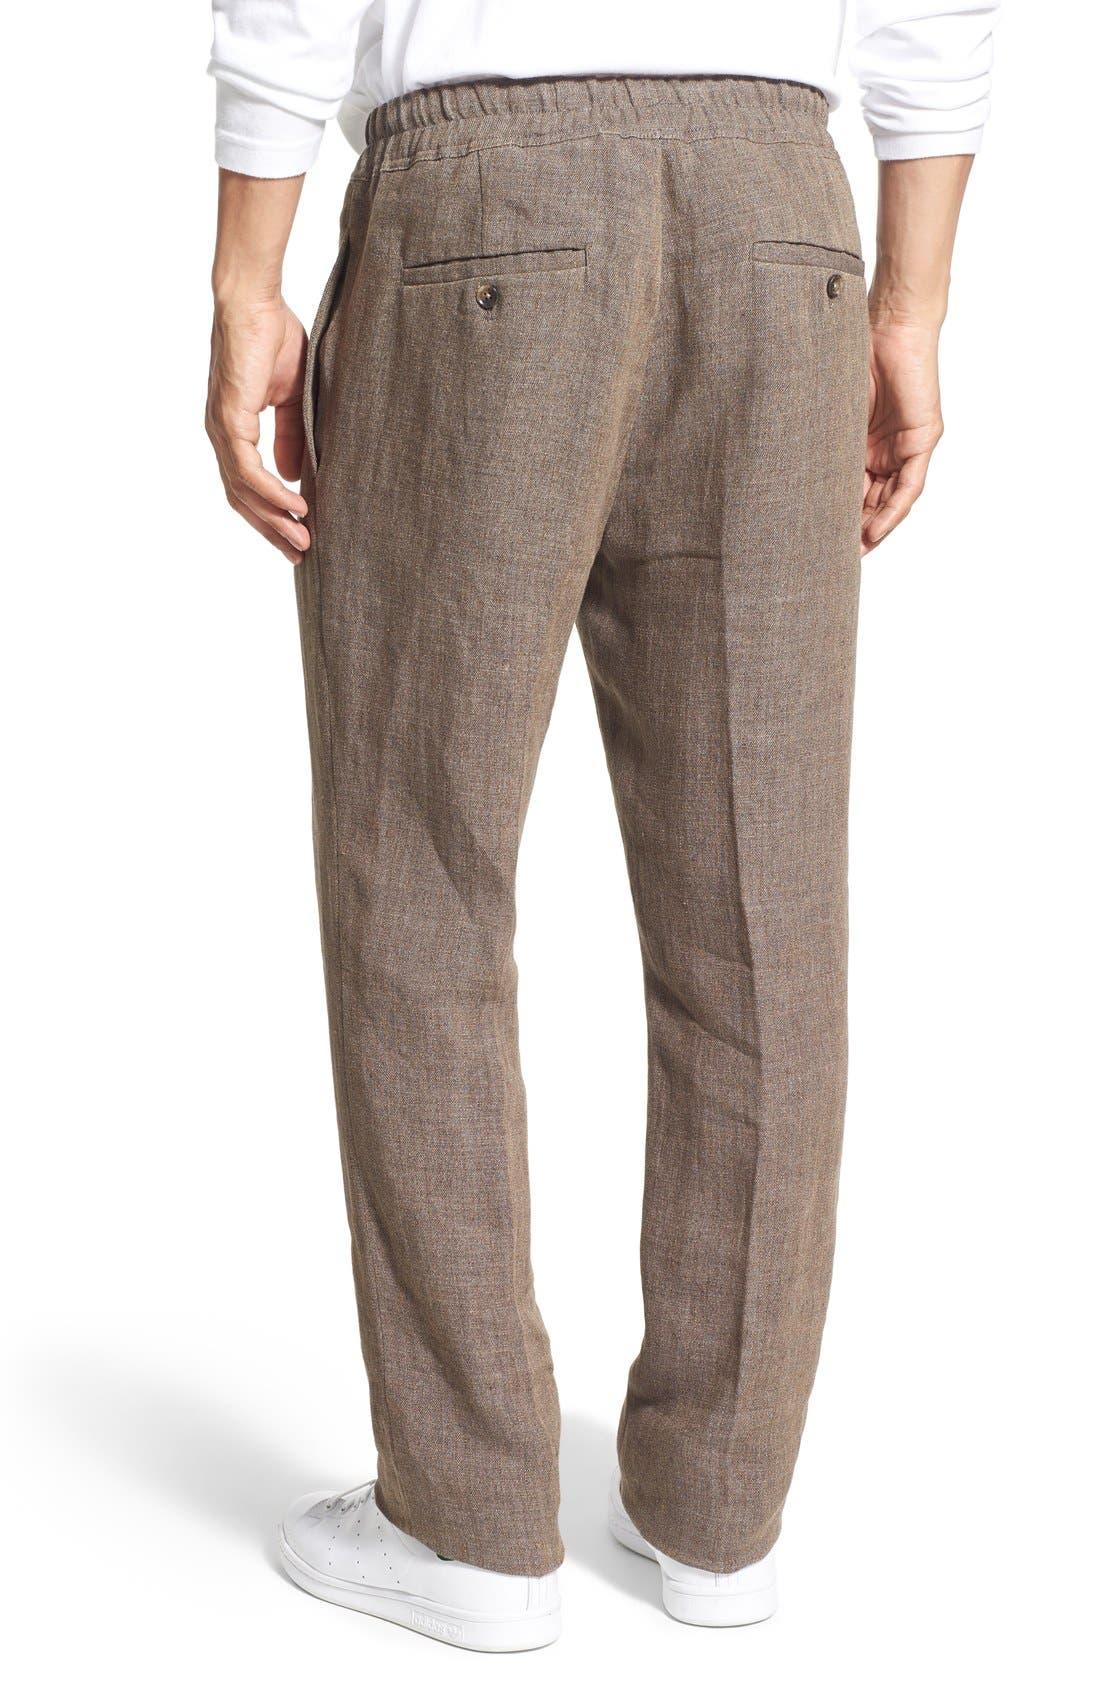 'Delave' Drawstring Linen Pants,                             Alternate thumbnail 2, color,                             207